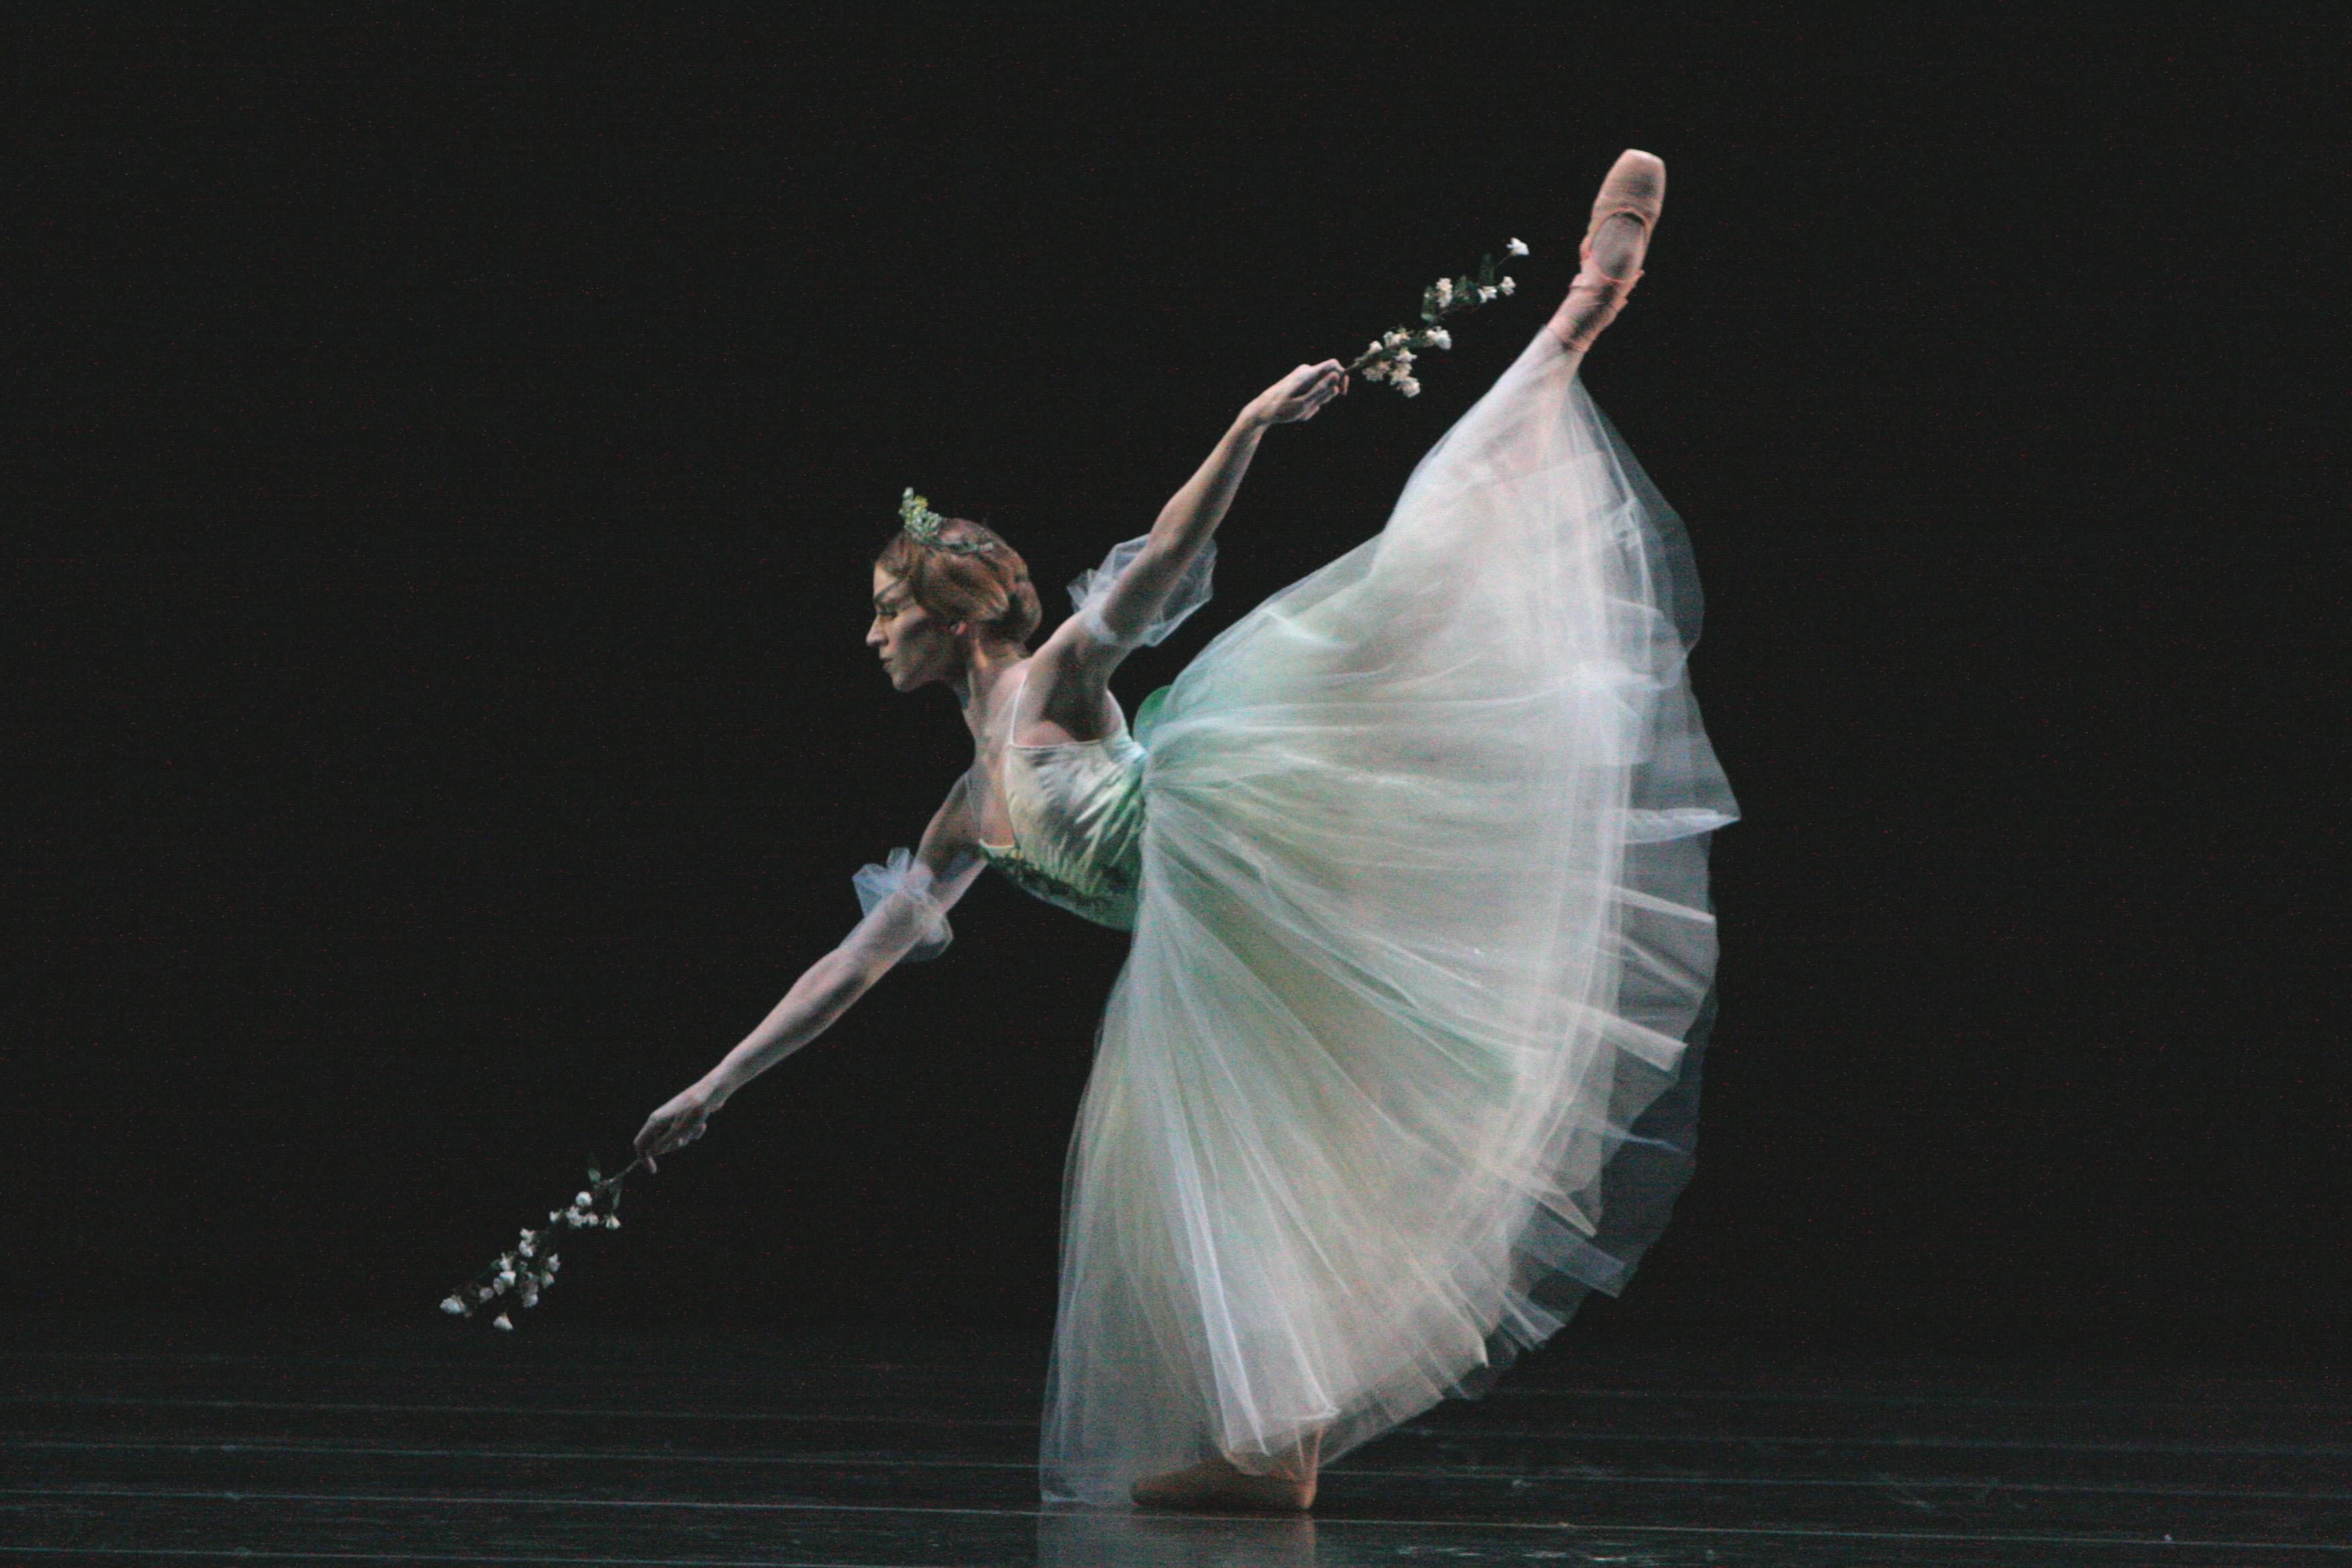 ballet dancer in long white dress bends on pointe